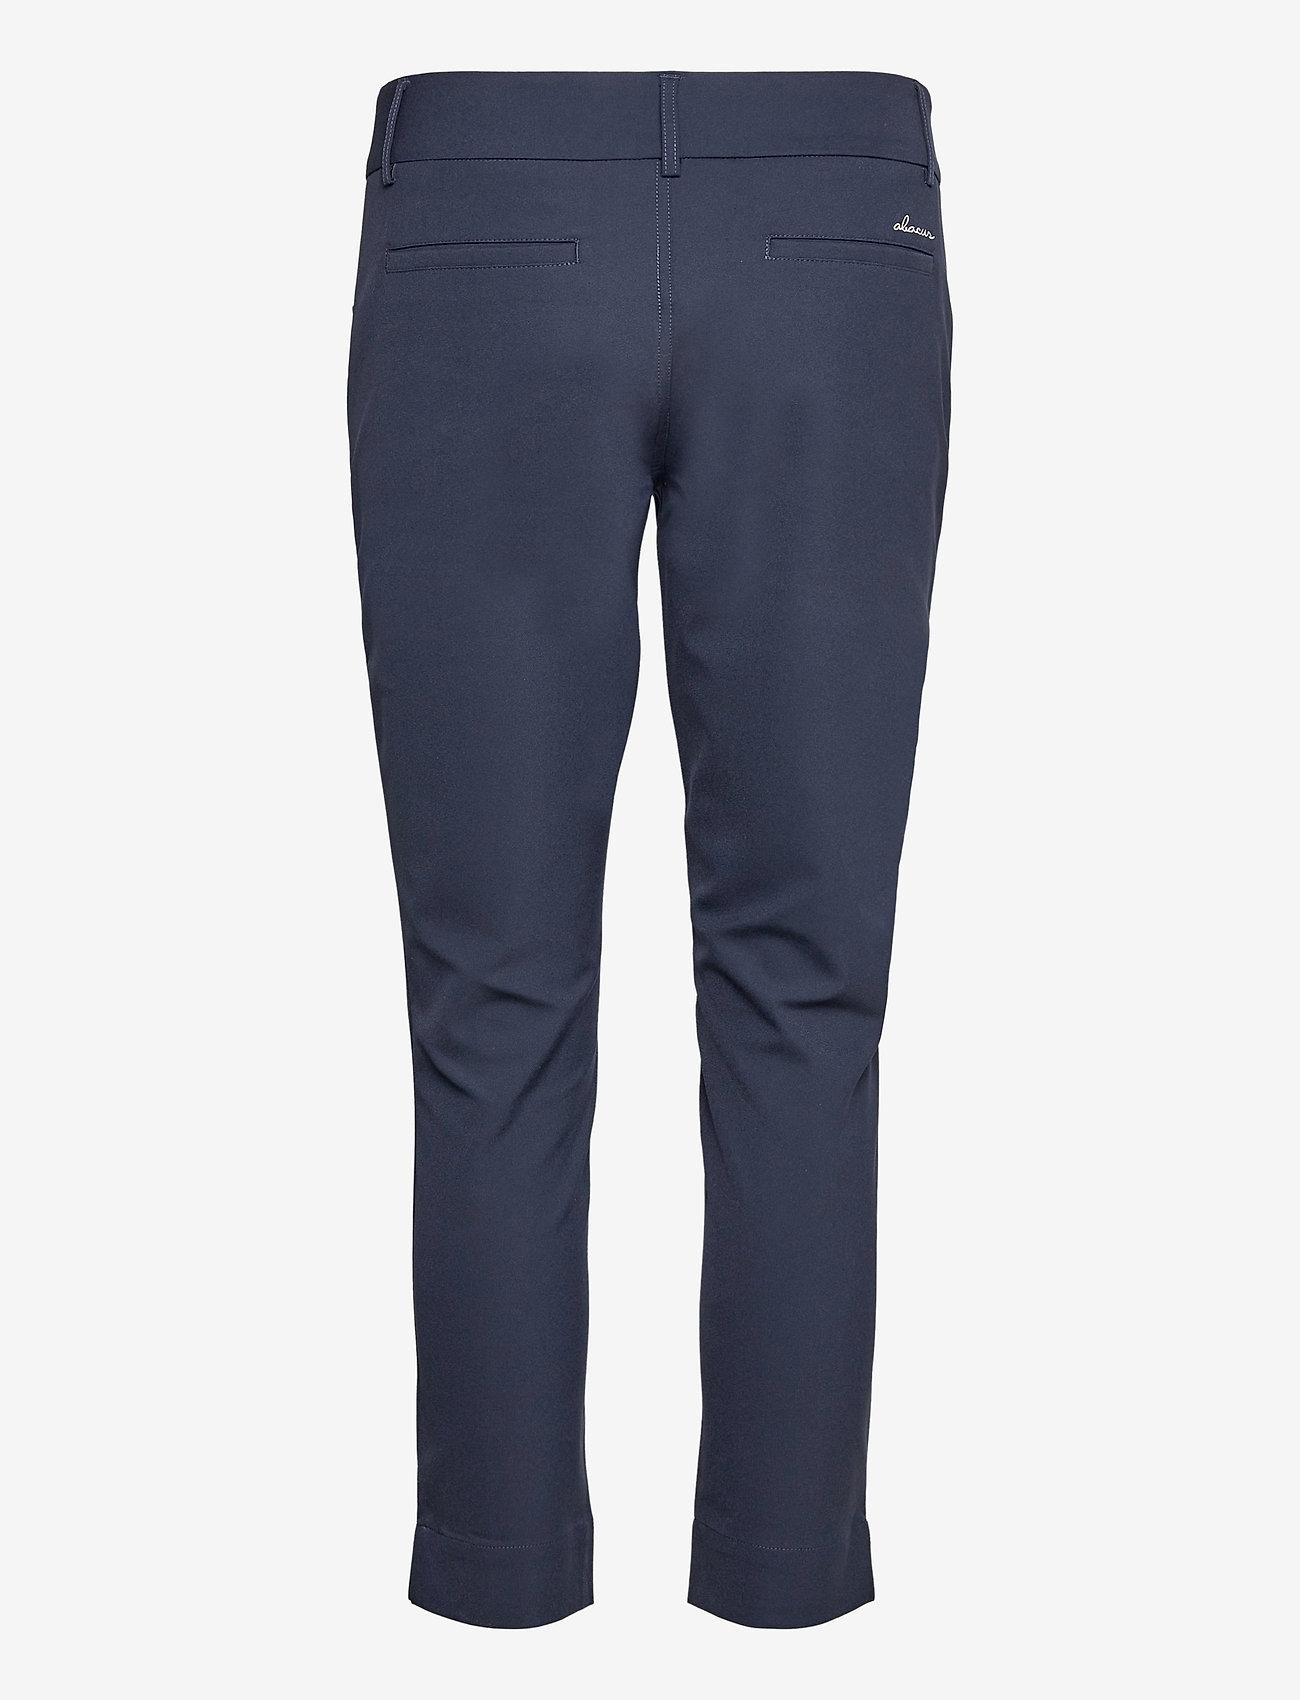 Abacus - Lds Grace 7/8 trousers 88cm - golfbroeken - navy - 1